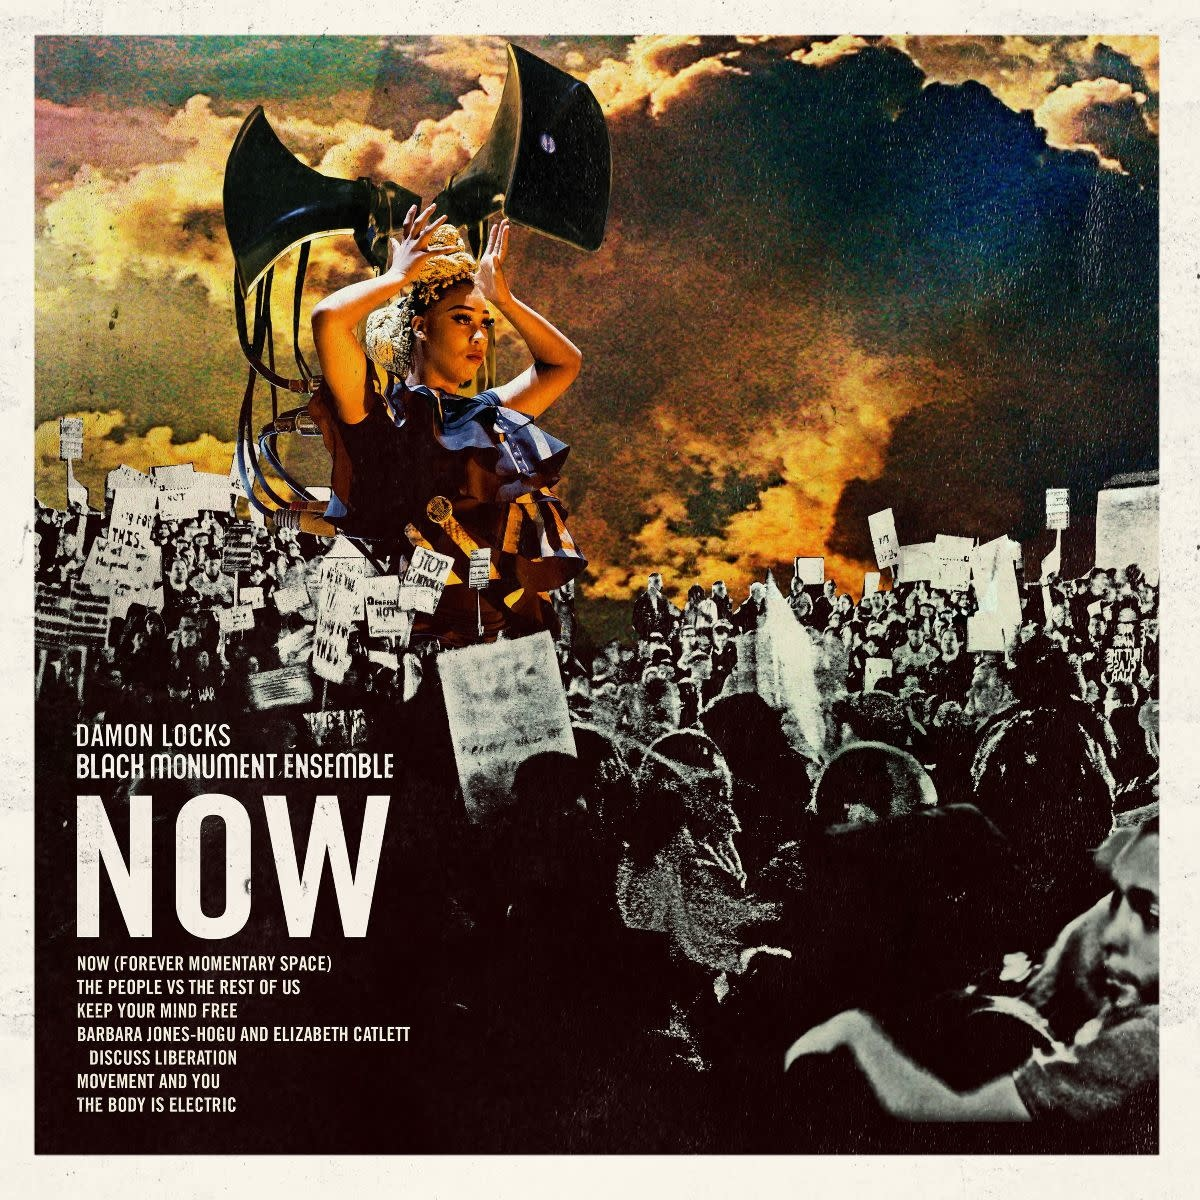 International Anthem Damon Locks Black Monument Ensemble - NOW